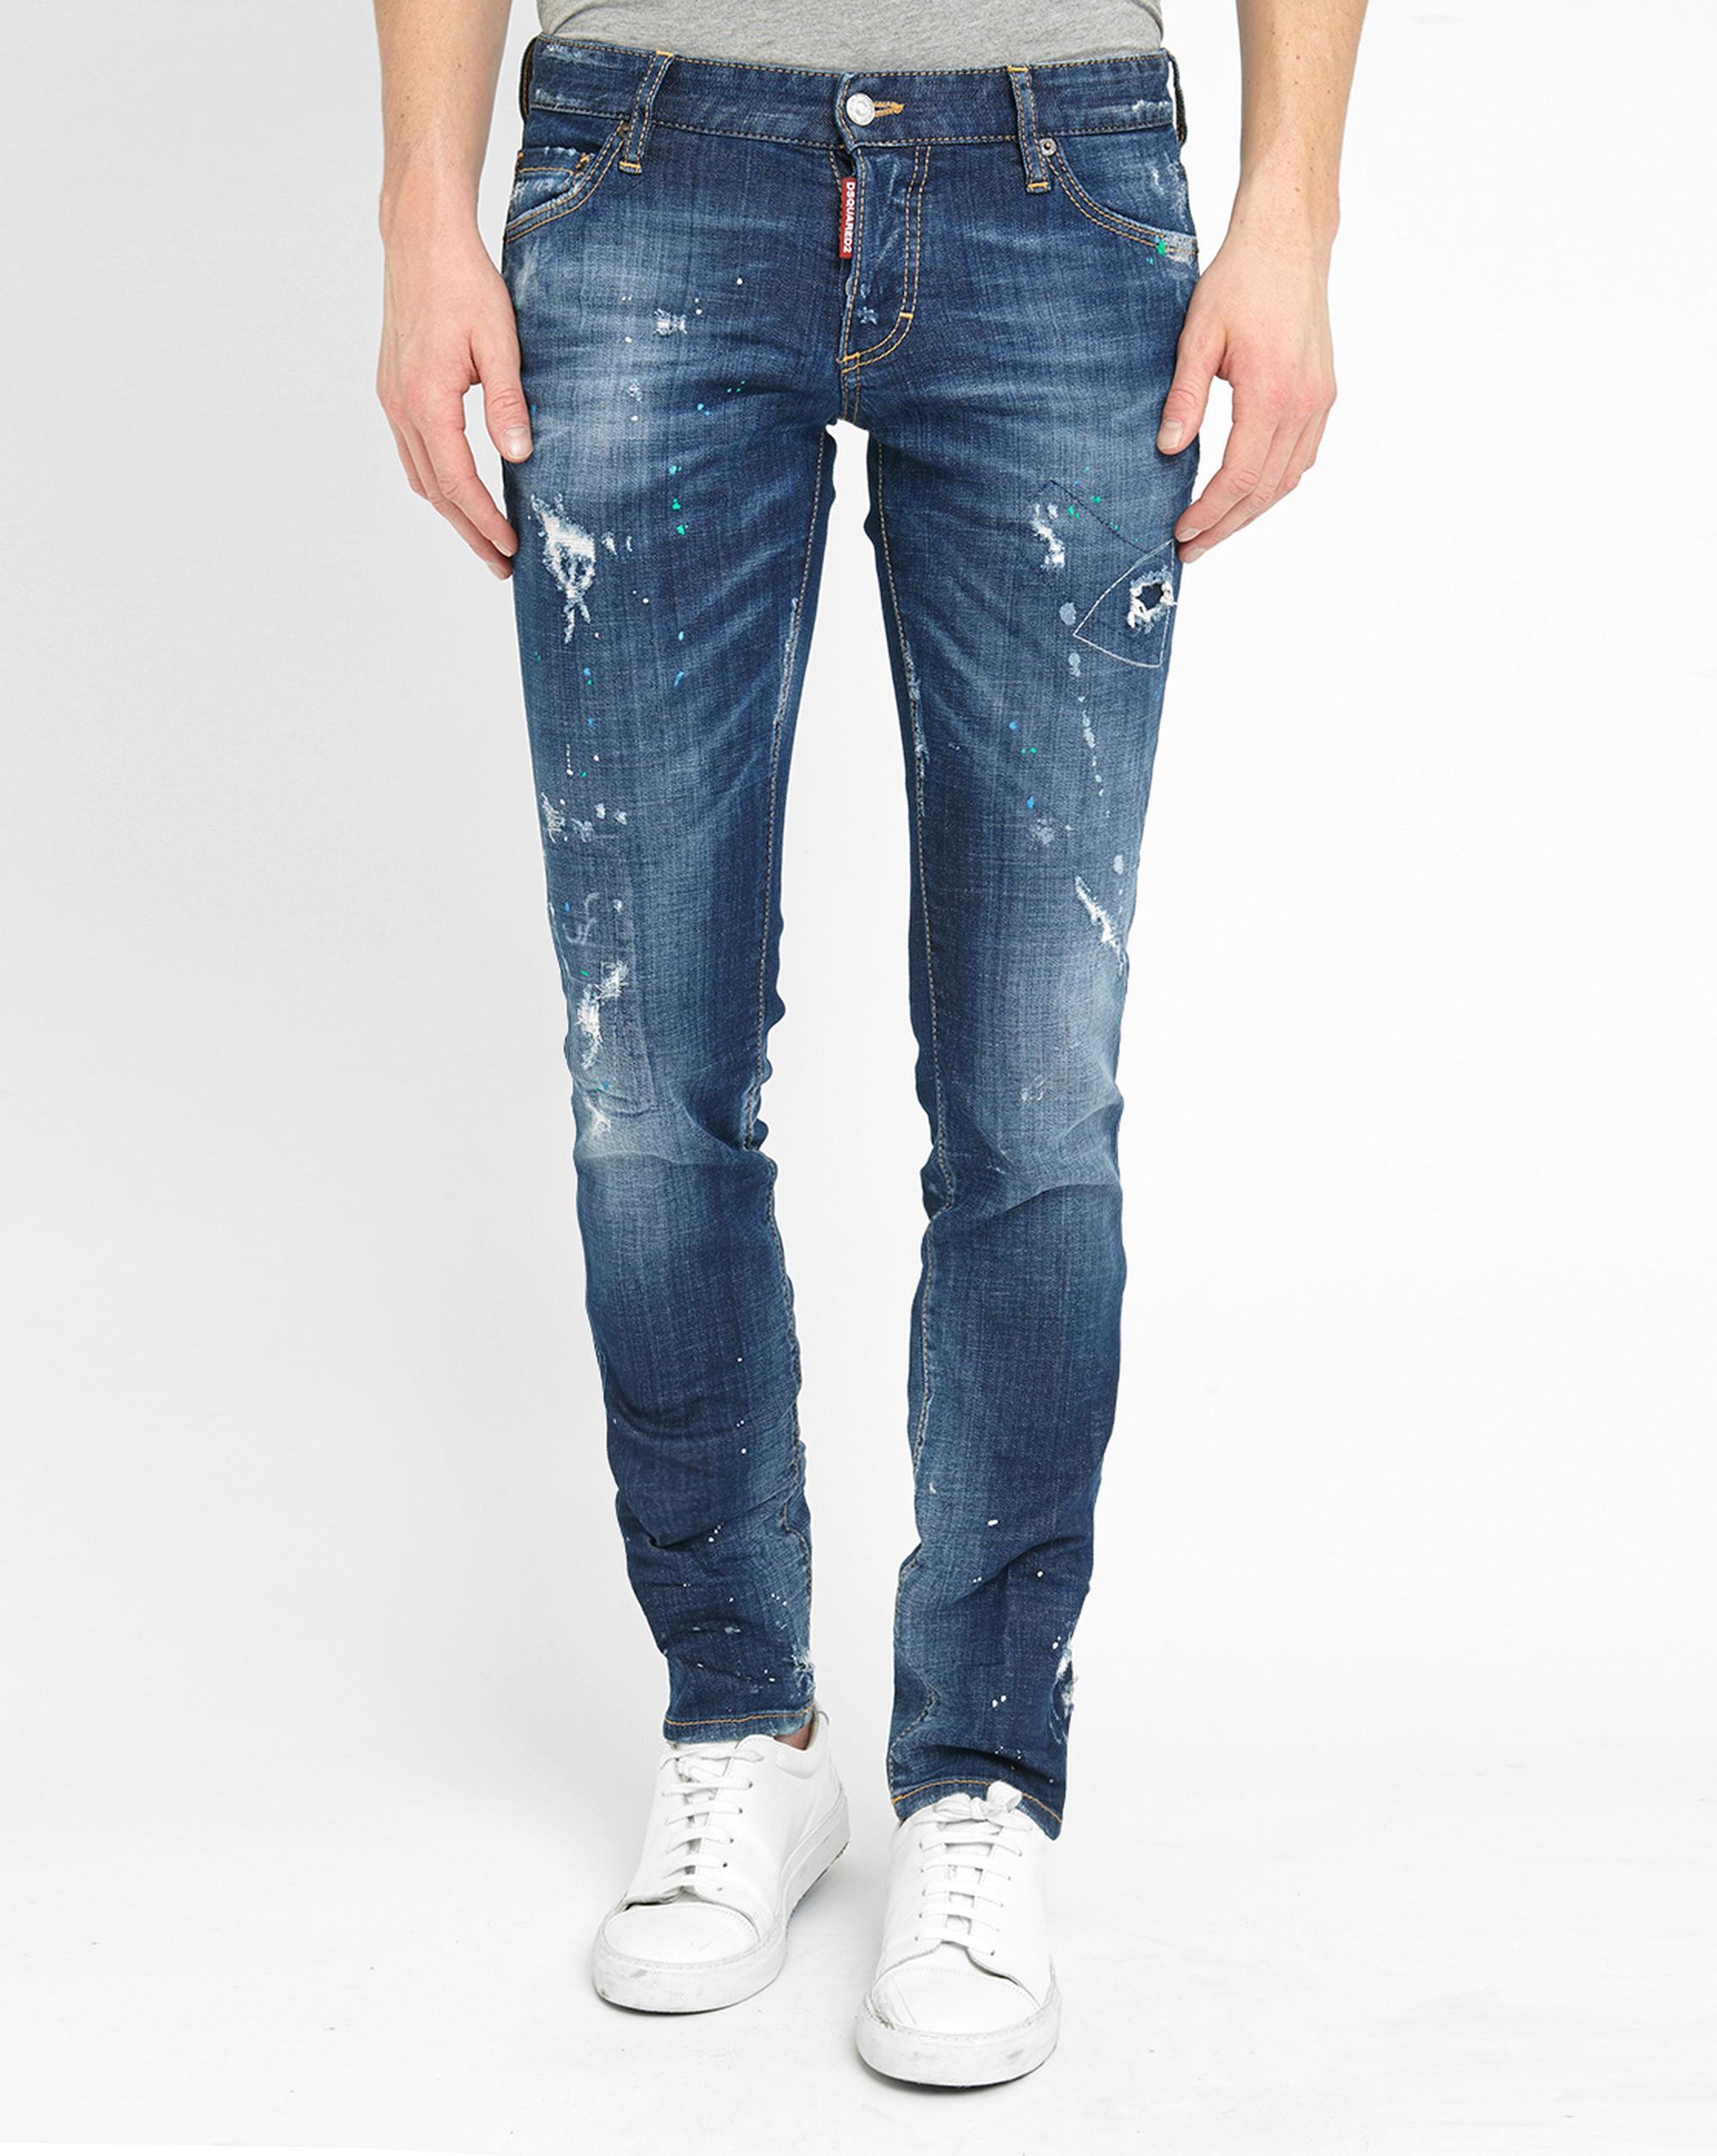 dsquared paint destroy patched slim fit jeans in blue for. Black Bedroom Furniture Sets. Home Design Ideas